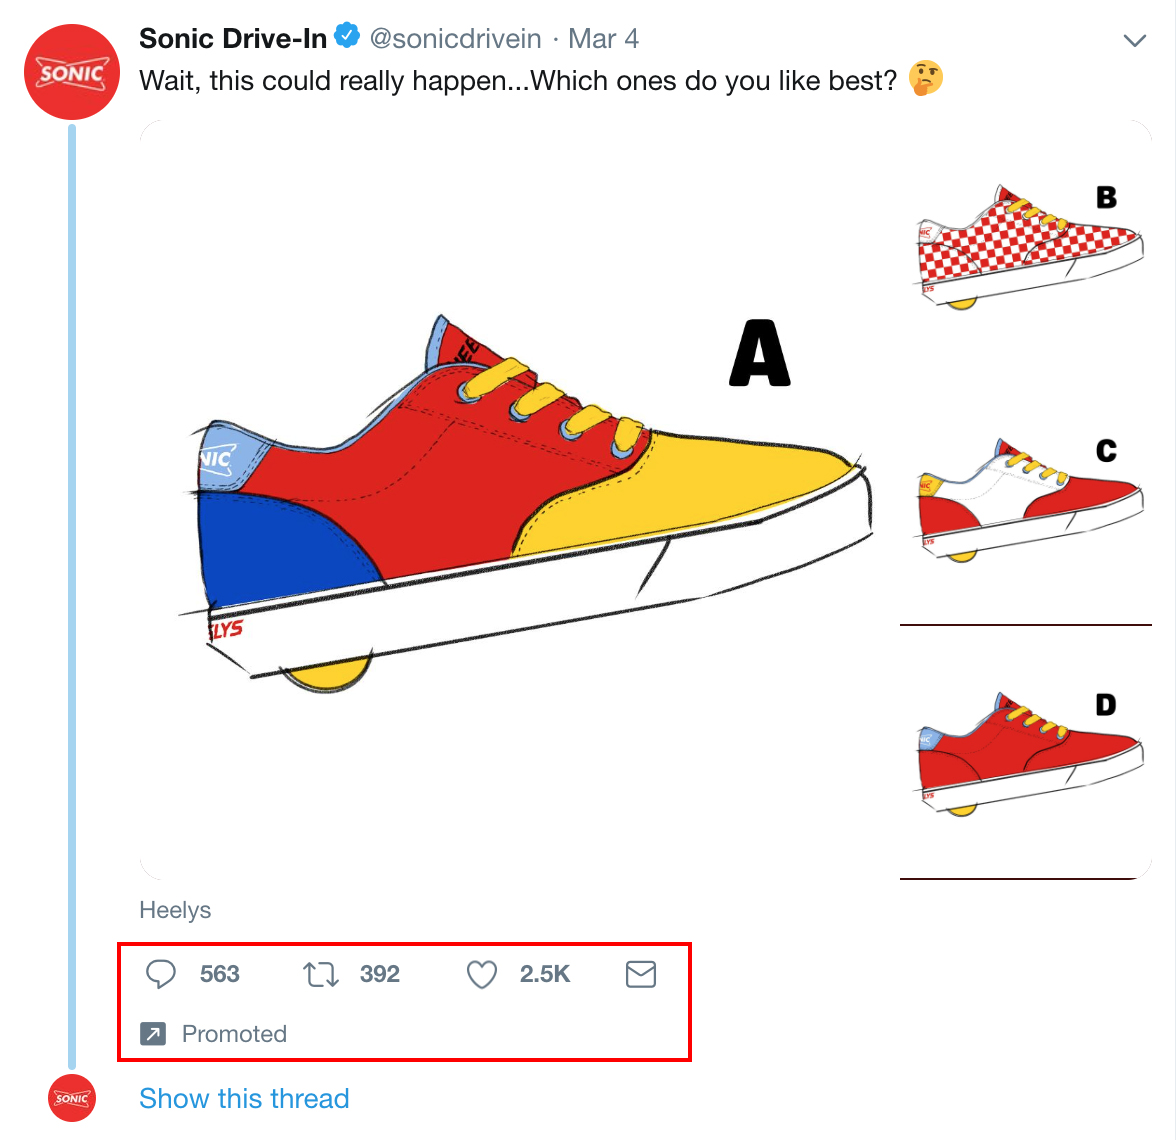 Sonic Tweet